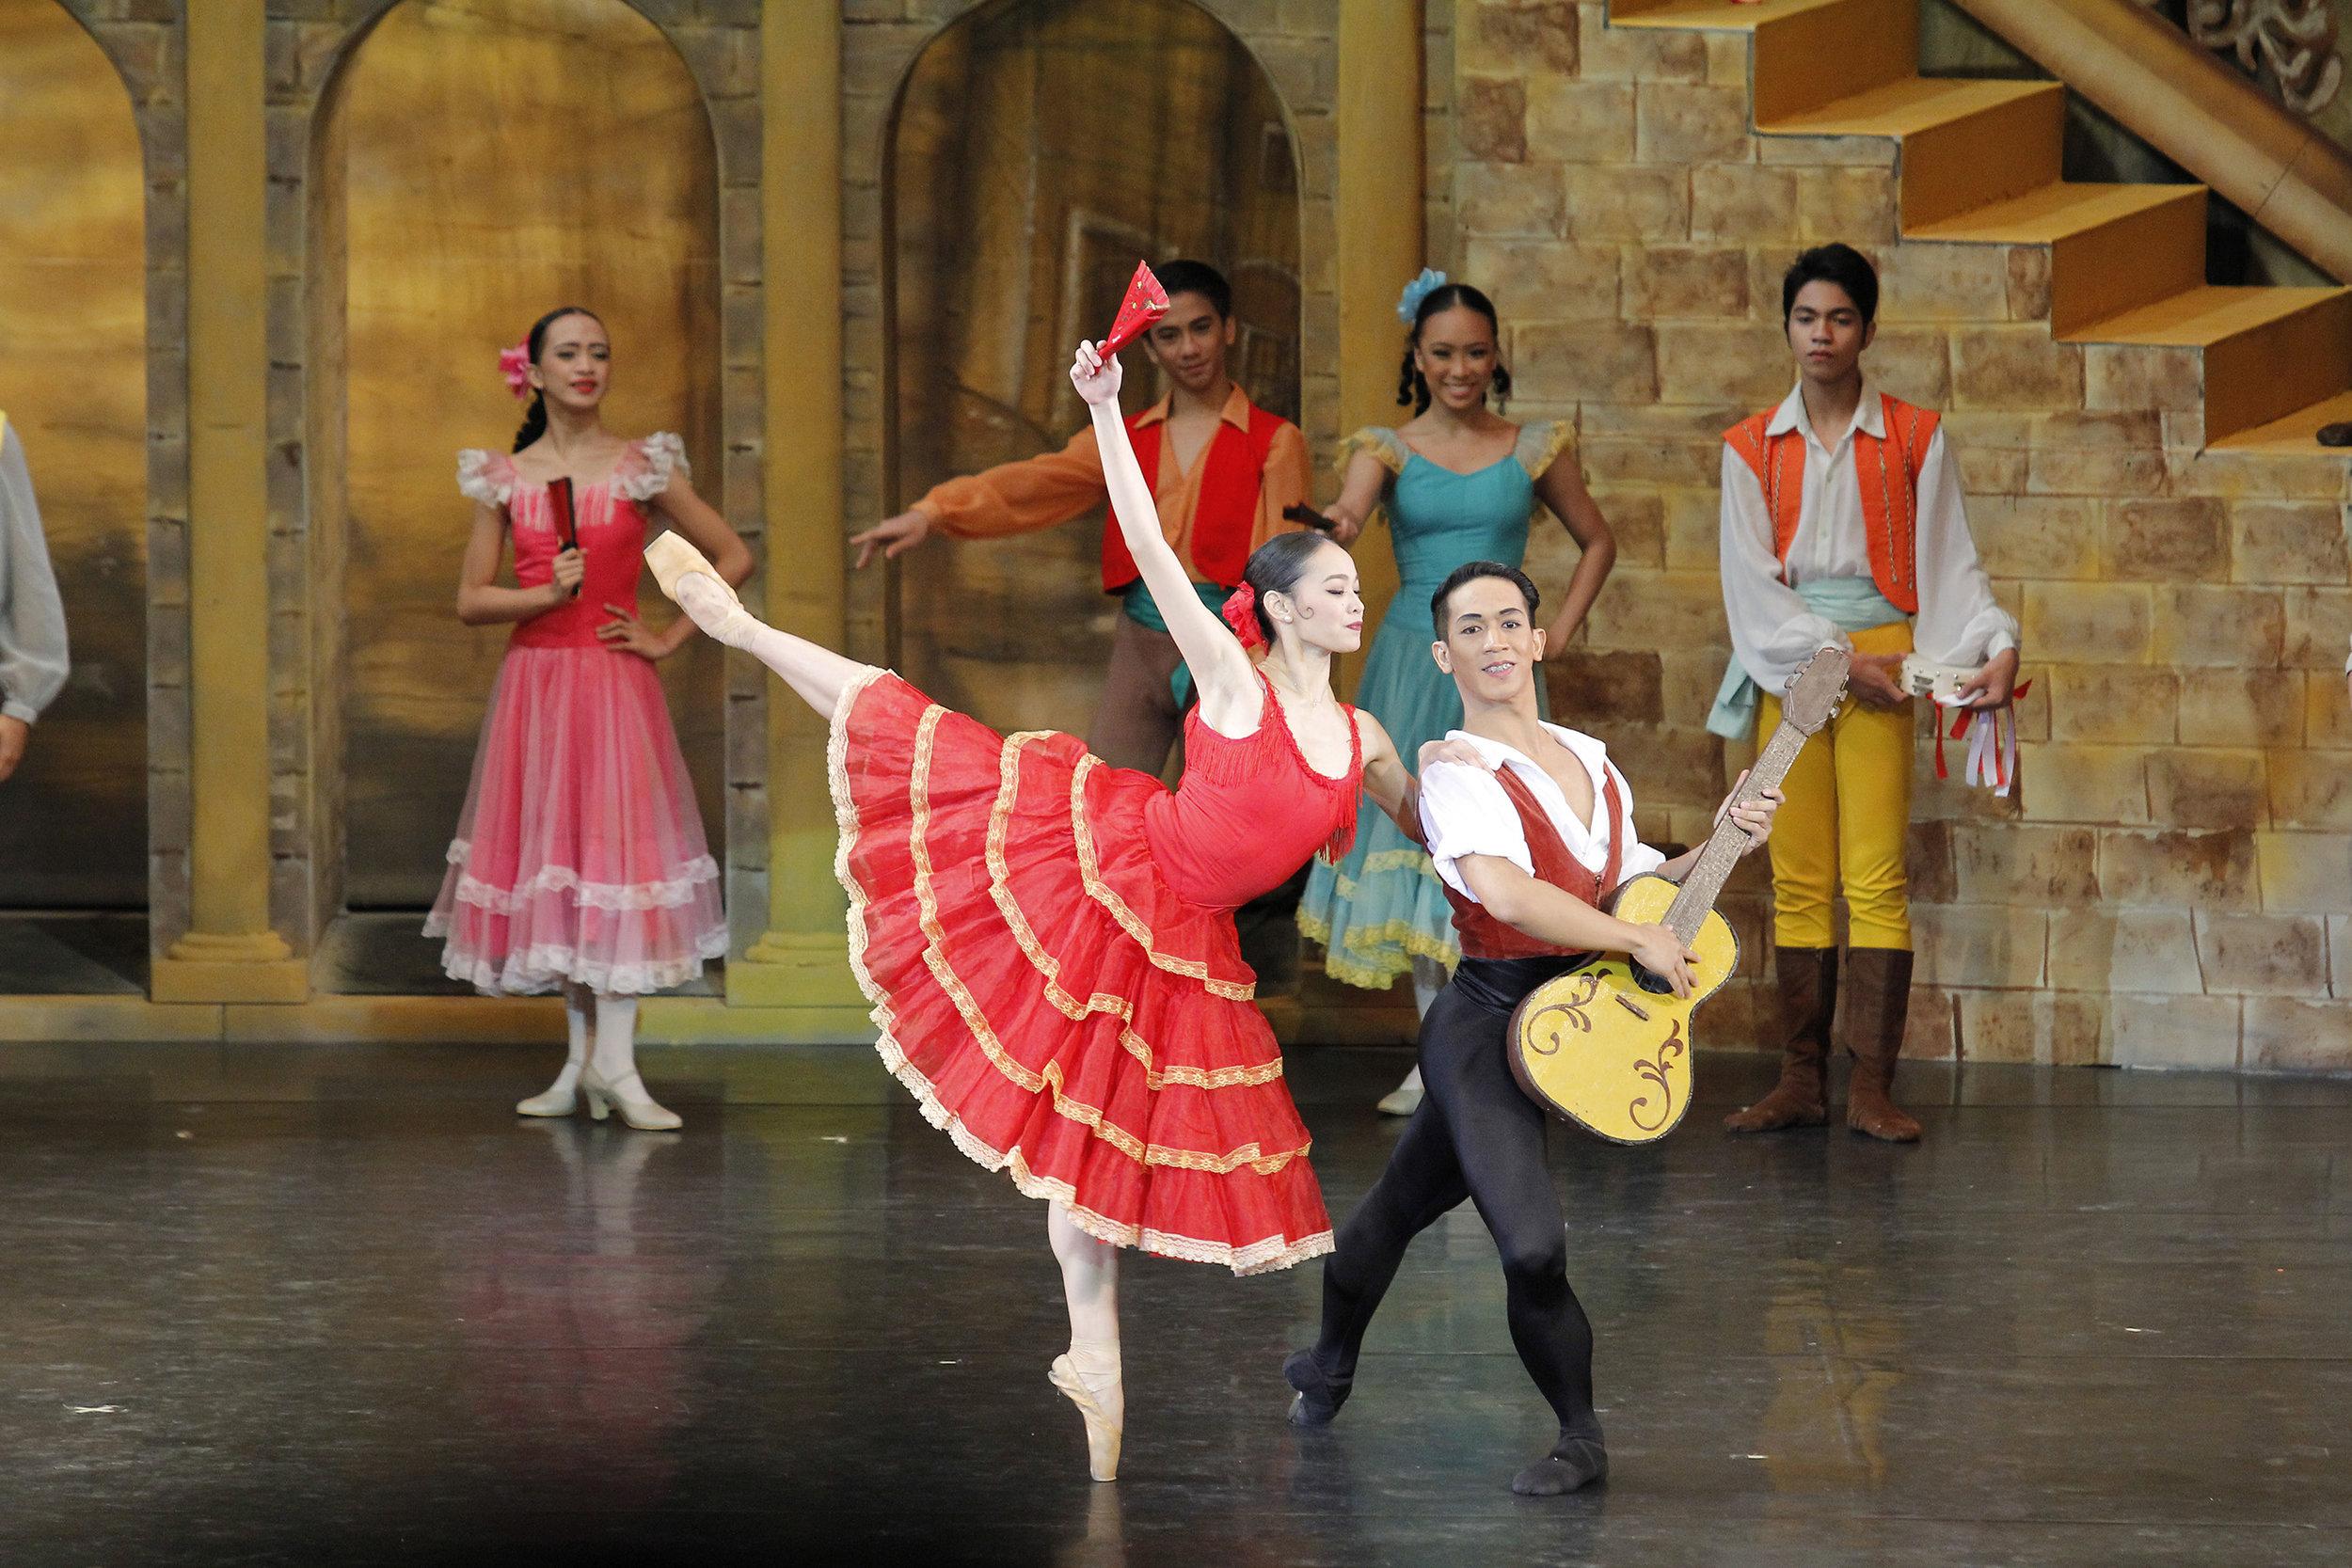 Rudolph fulfilled his long-time dream role when he danced as Basilio in Ballet Manila's    Don Quixote . Photo by Ocs Alvarez